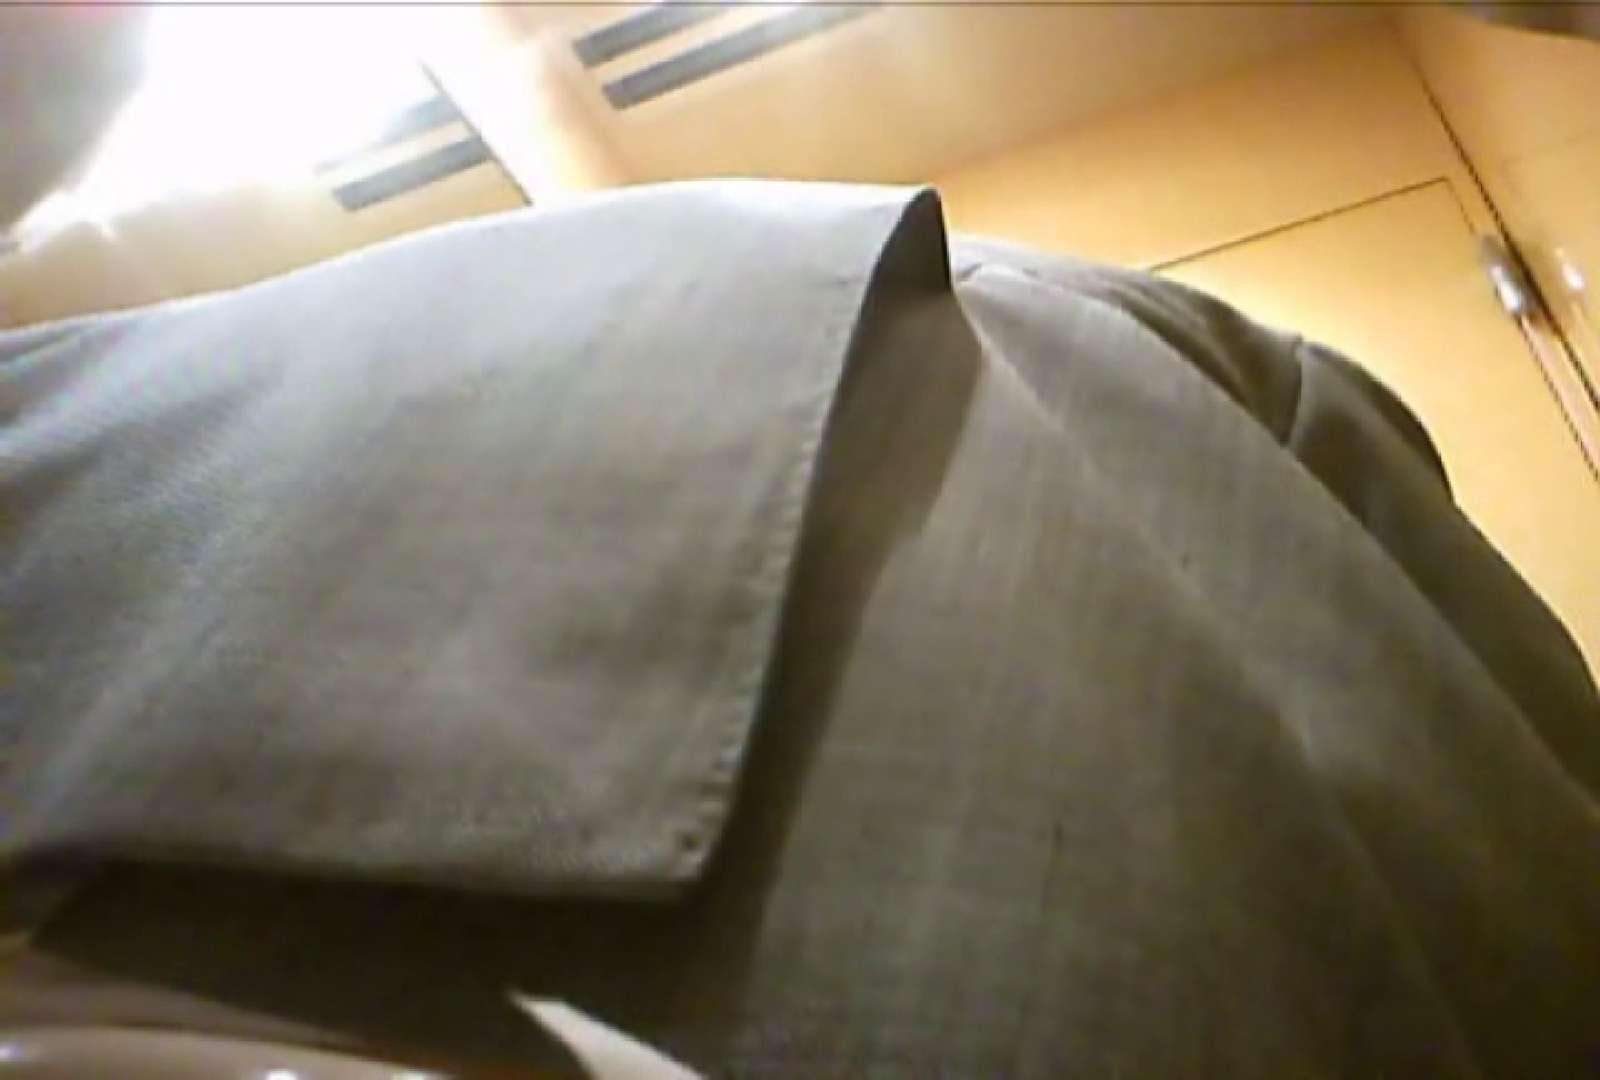 SEASON 2ND!掴み取りさんの洗面所覗き!in新幹線!VOL.02 スーツボーイズ | ノンケボーイズ  82pic 35